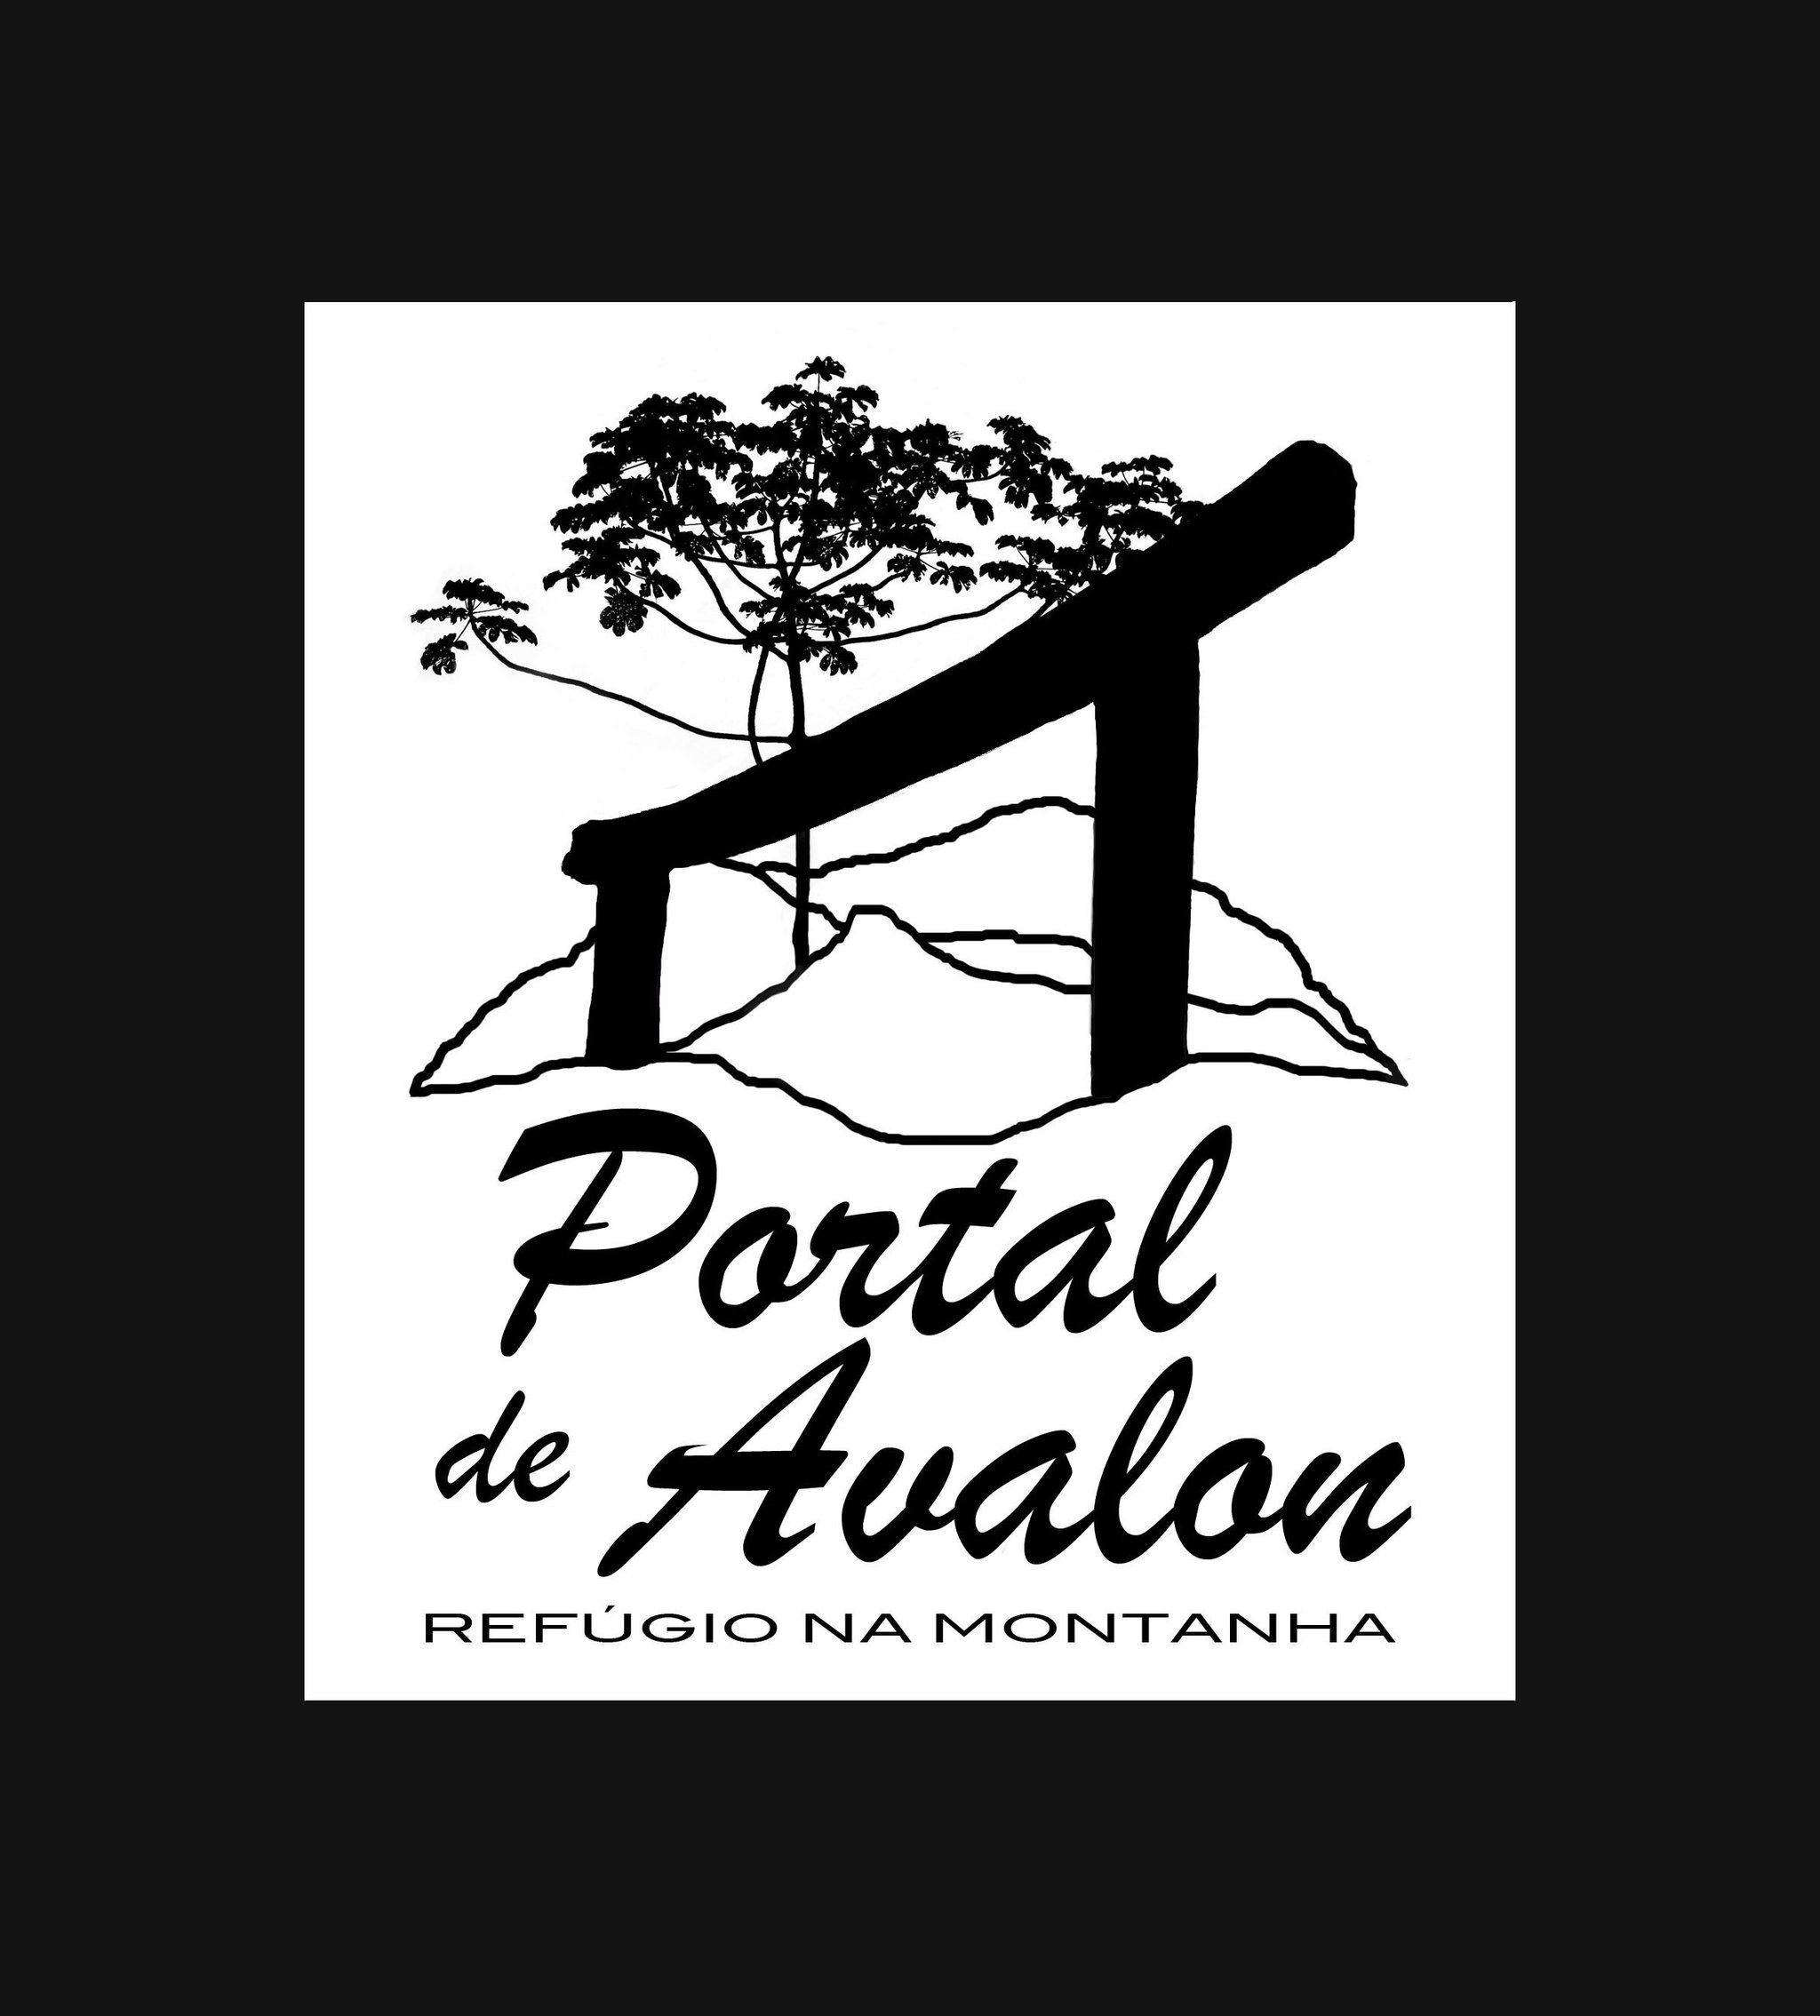 Portal de Avalon